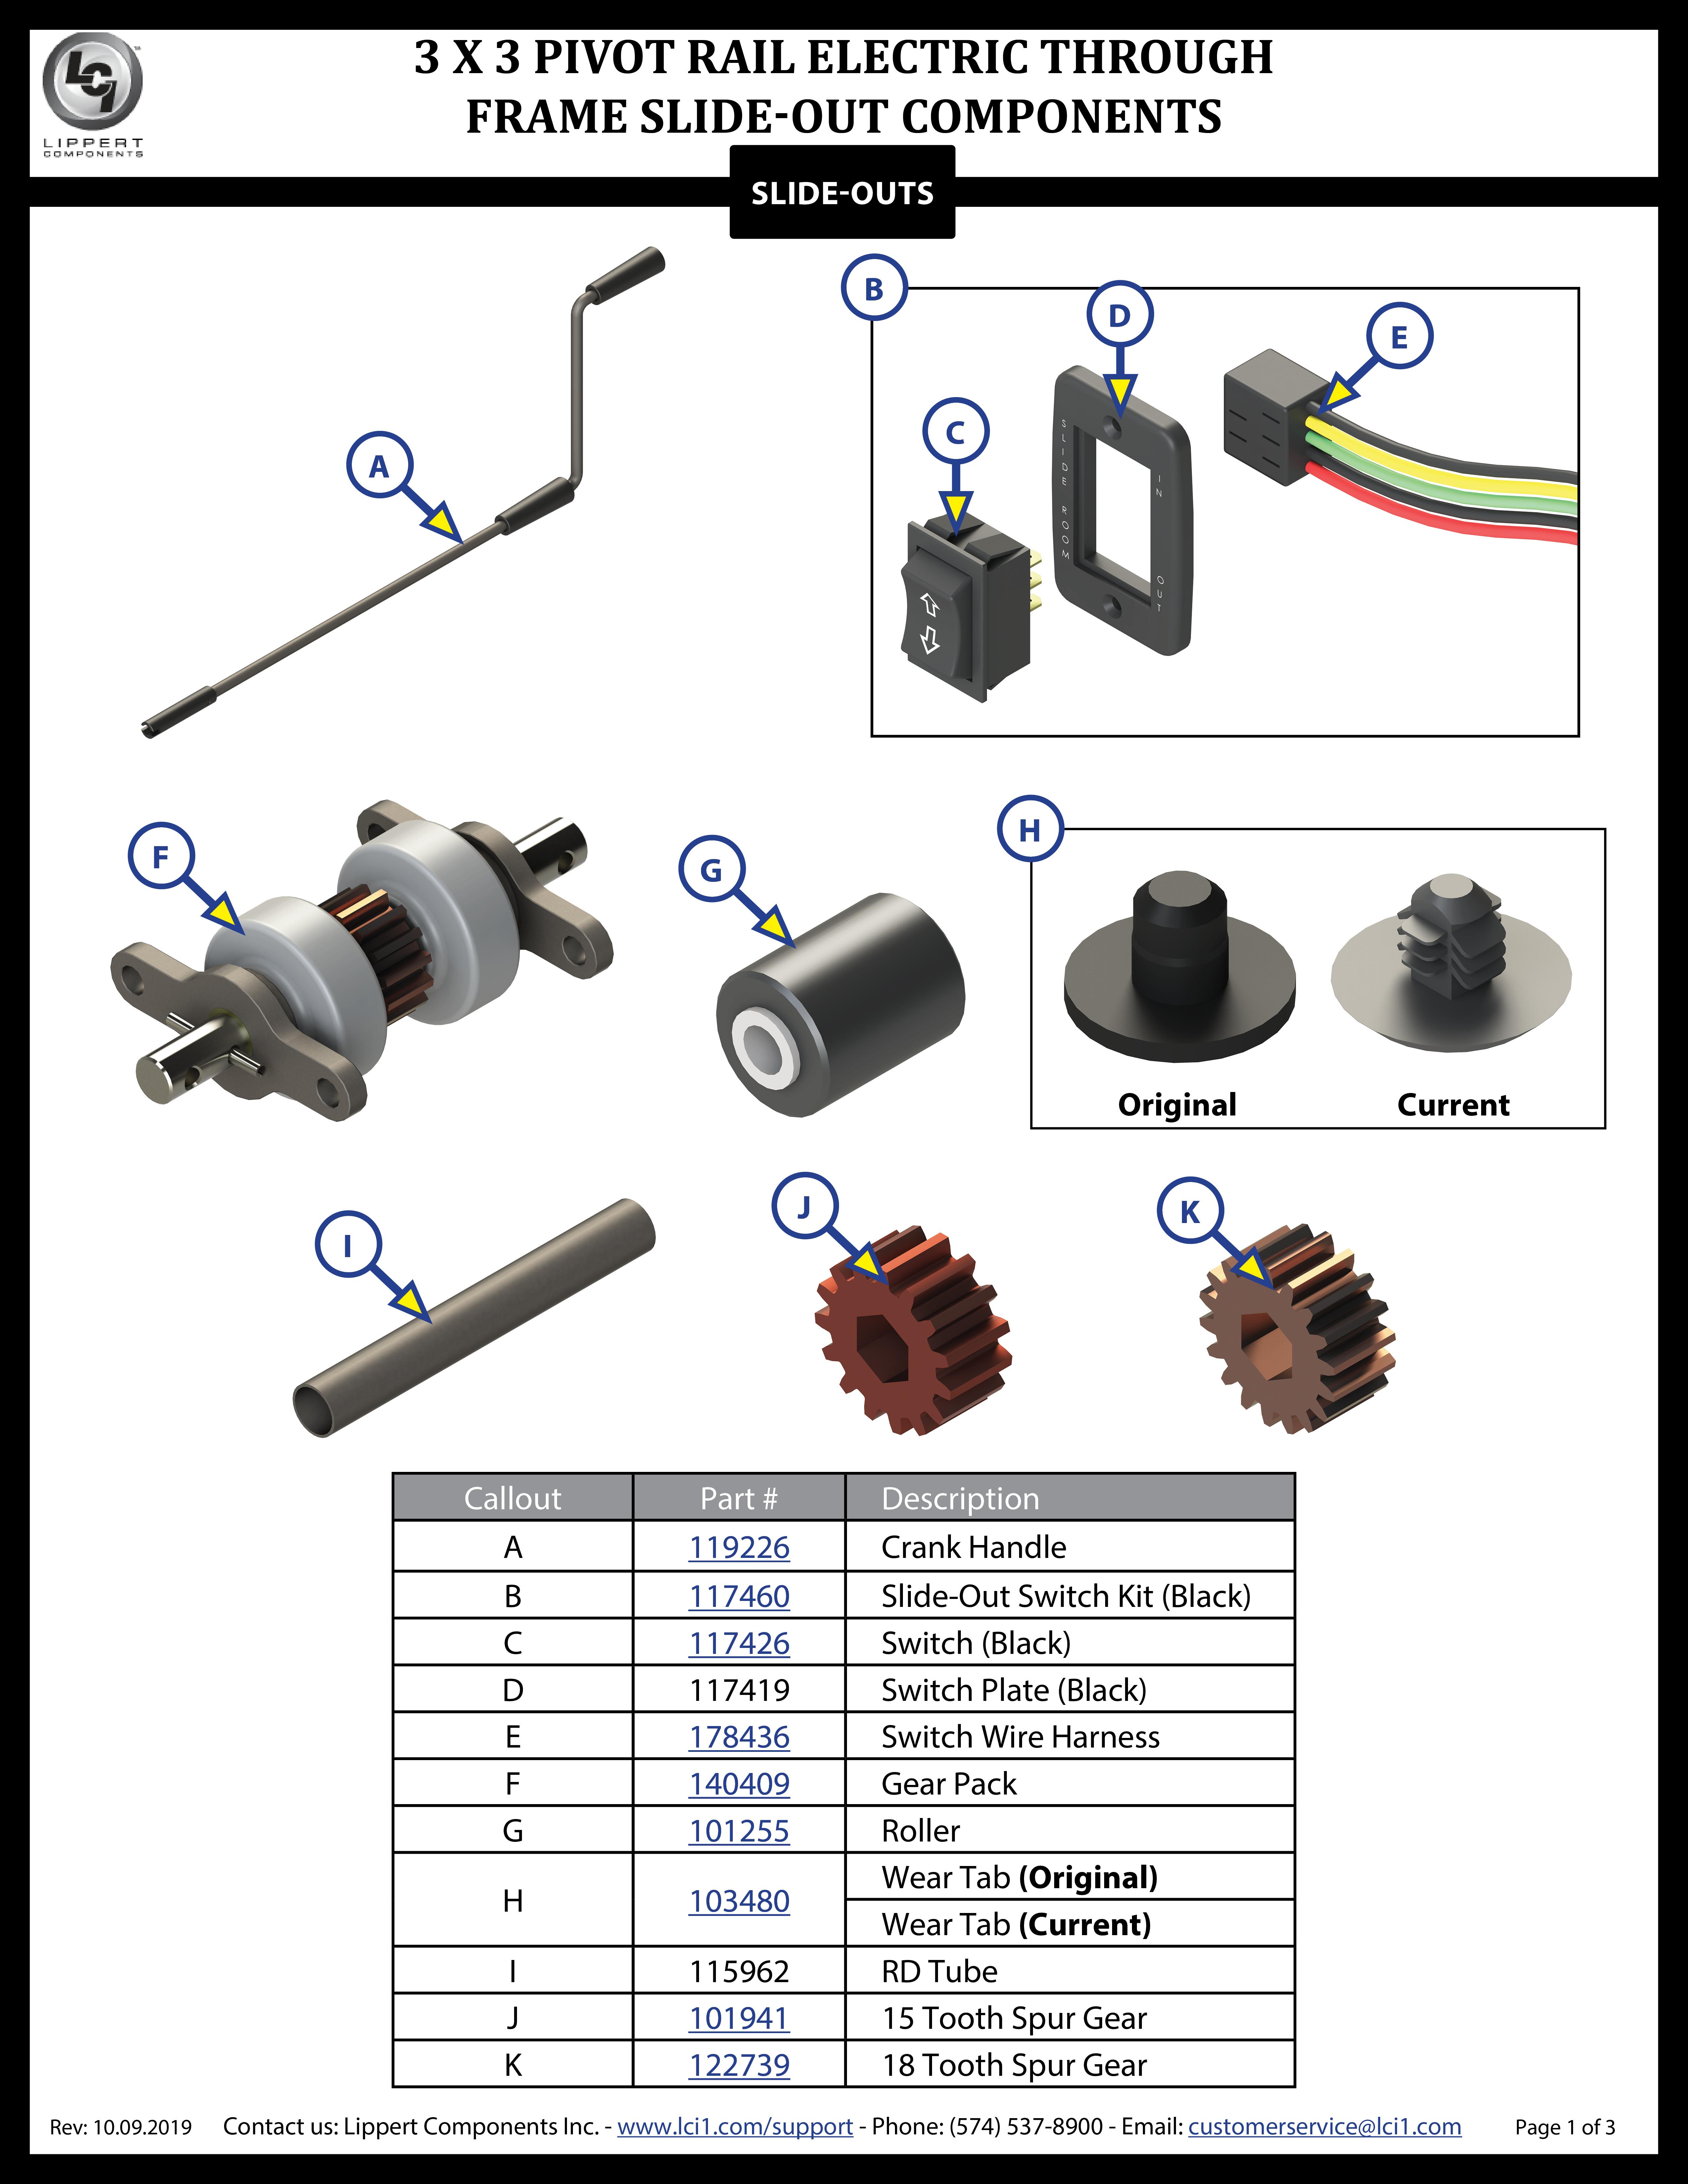 3 x 3 Electric Pivot Rail Slide-Out Components